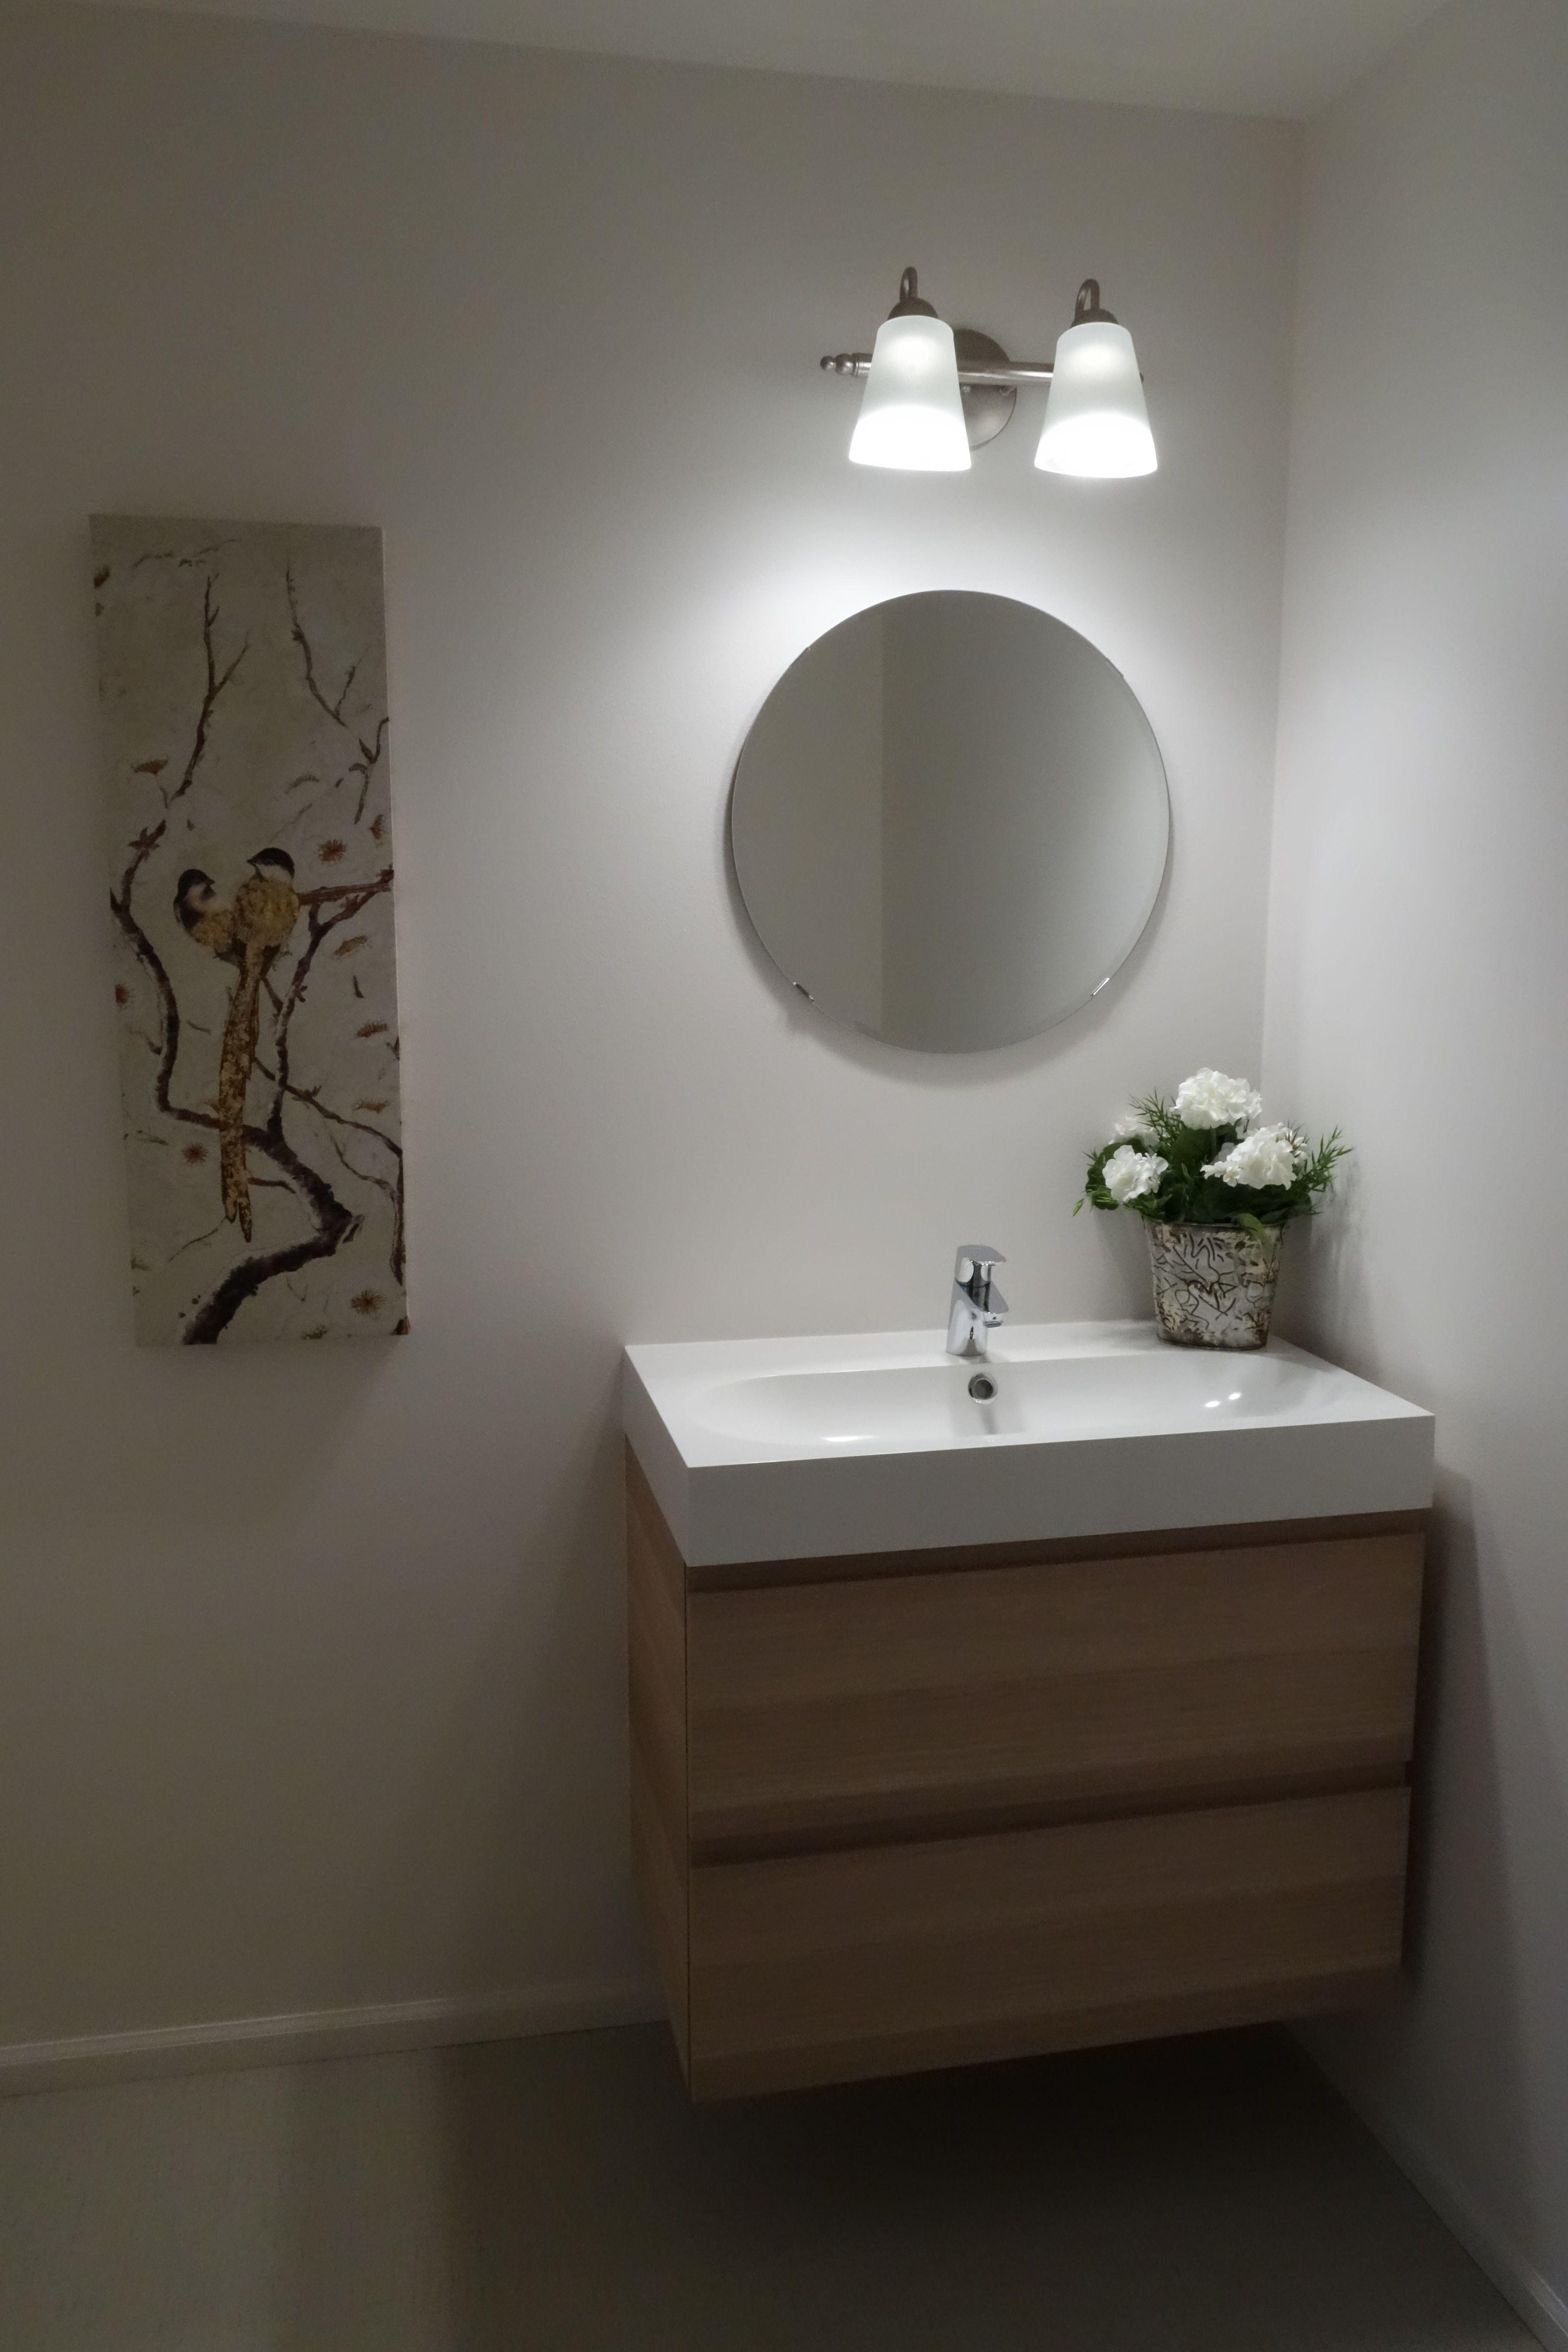 Bathroom Remodel Ikea Godmorgon Cabinet Projects Pinterest